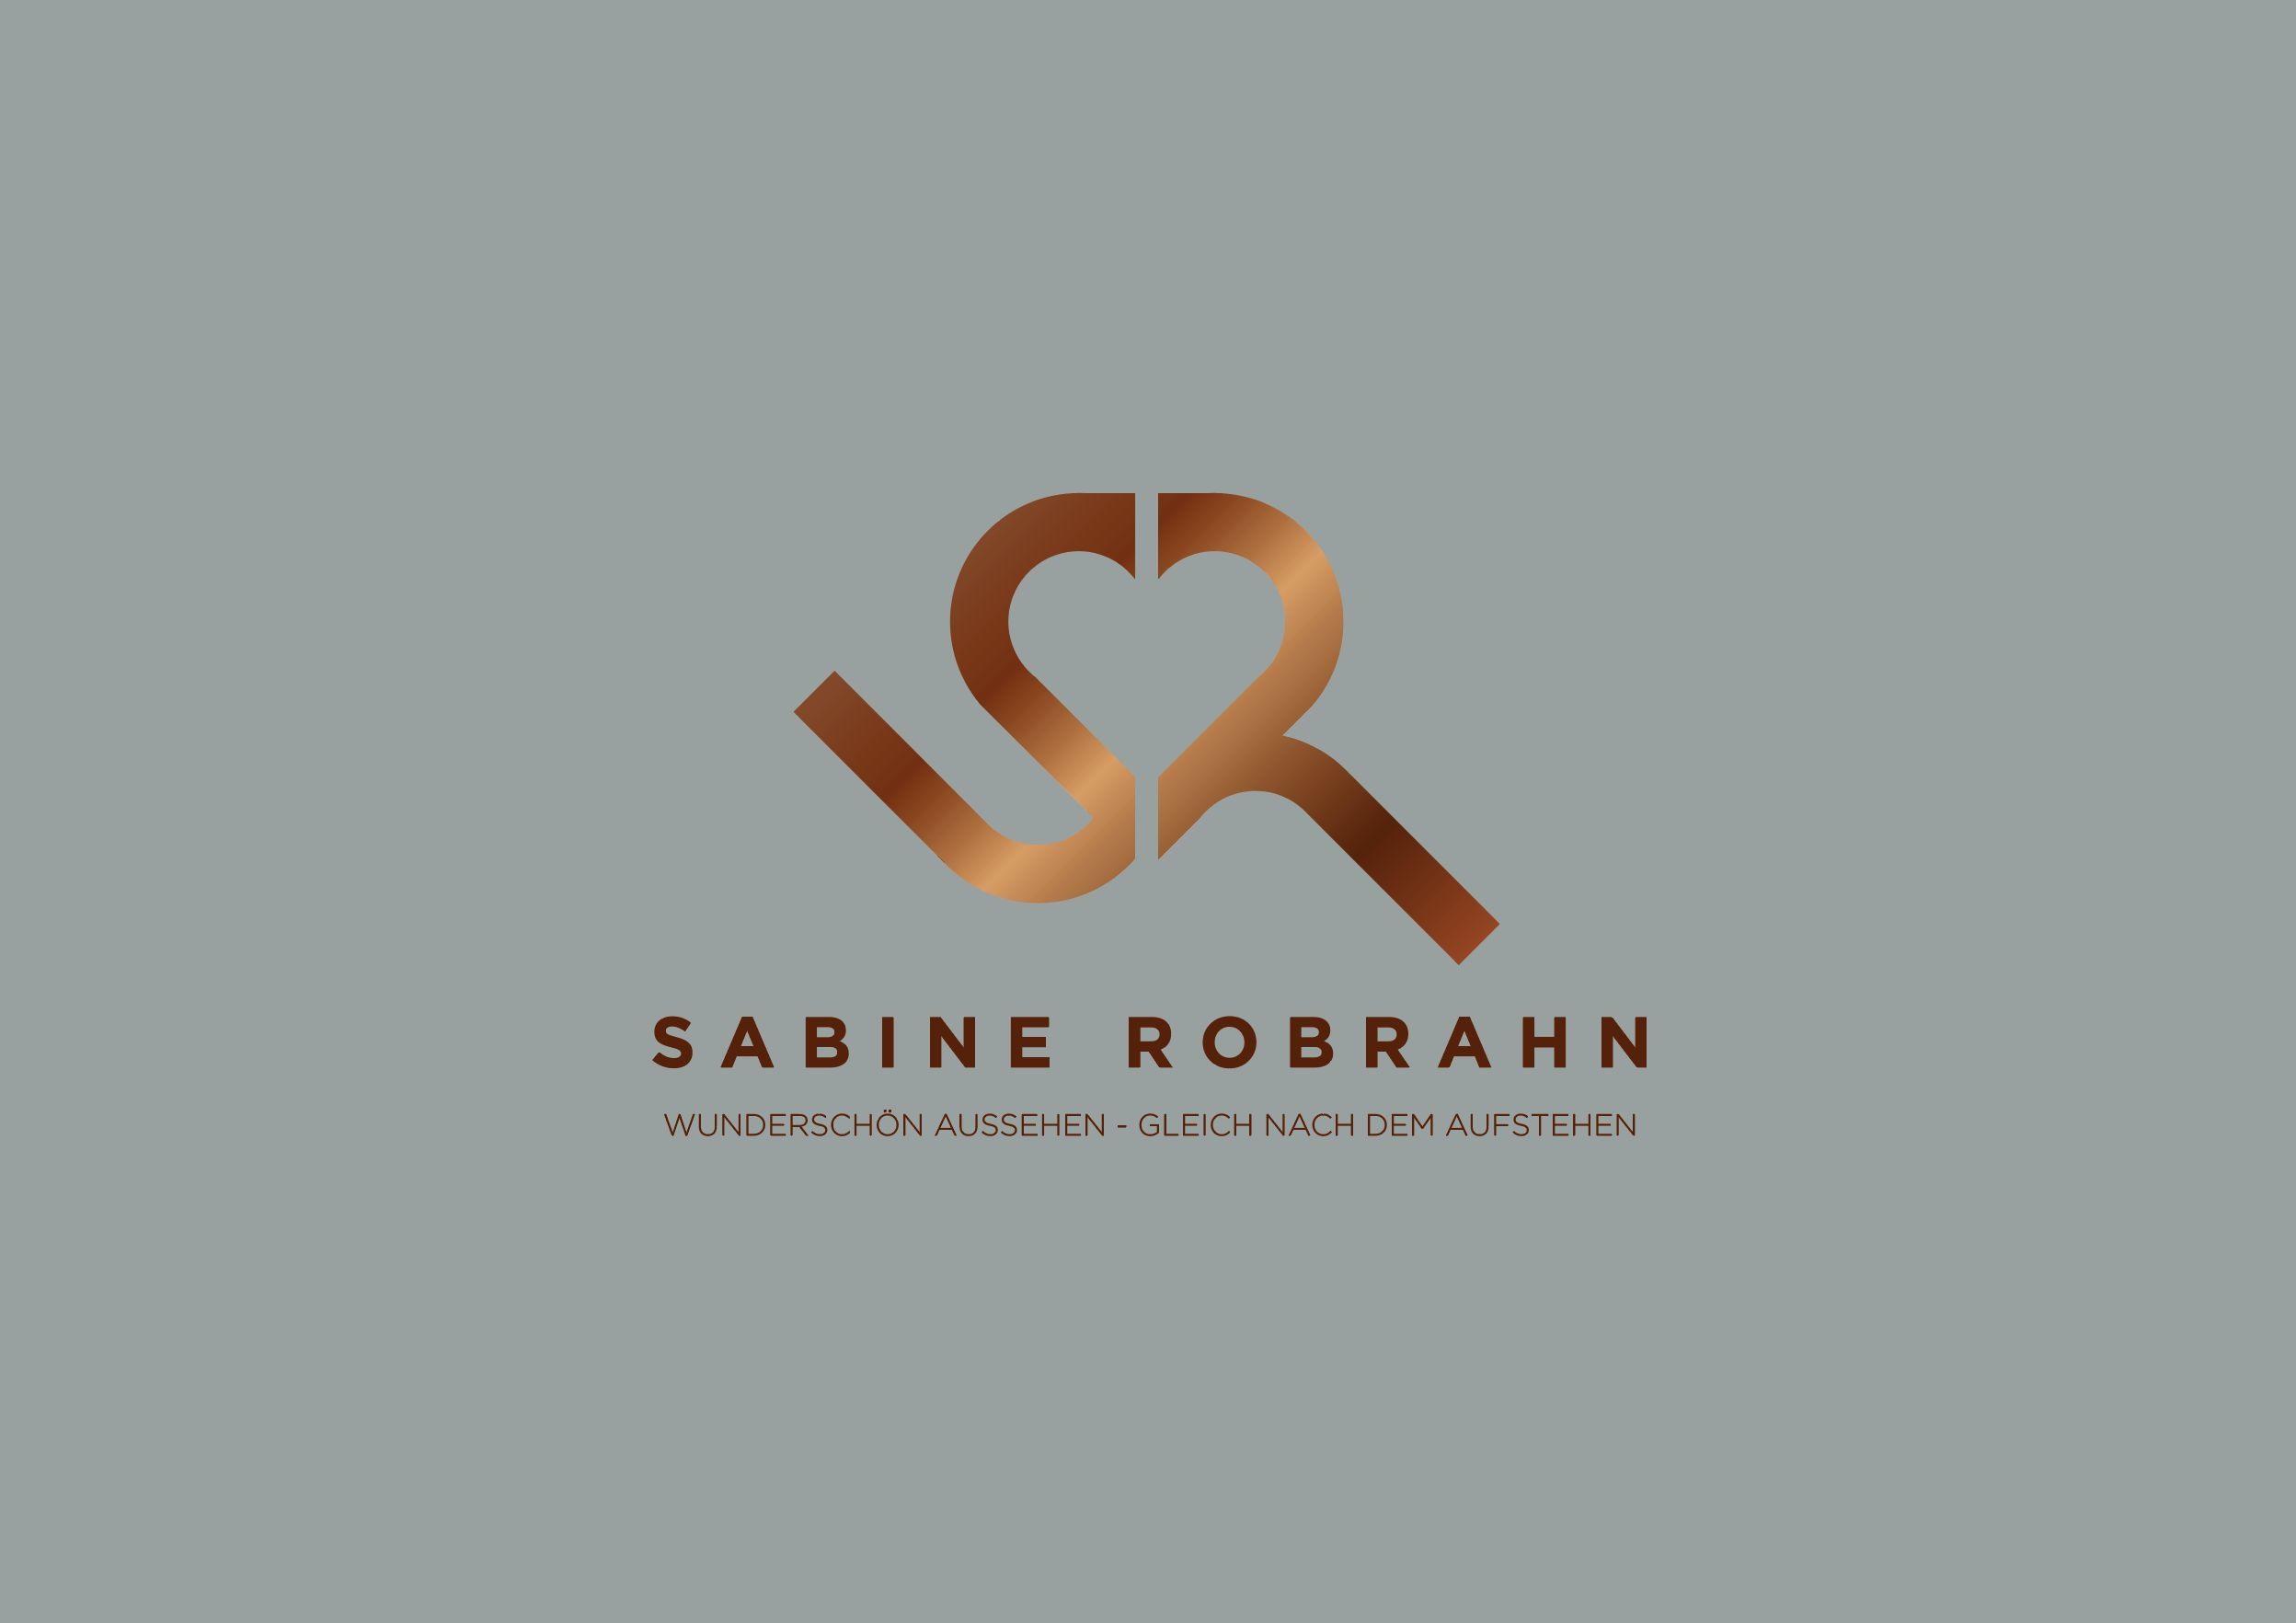 Sabine Robrahn